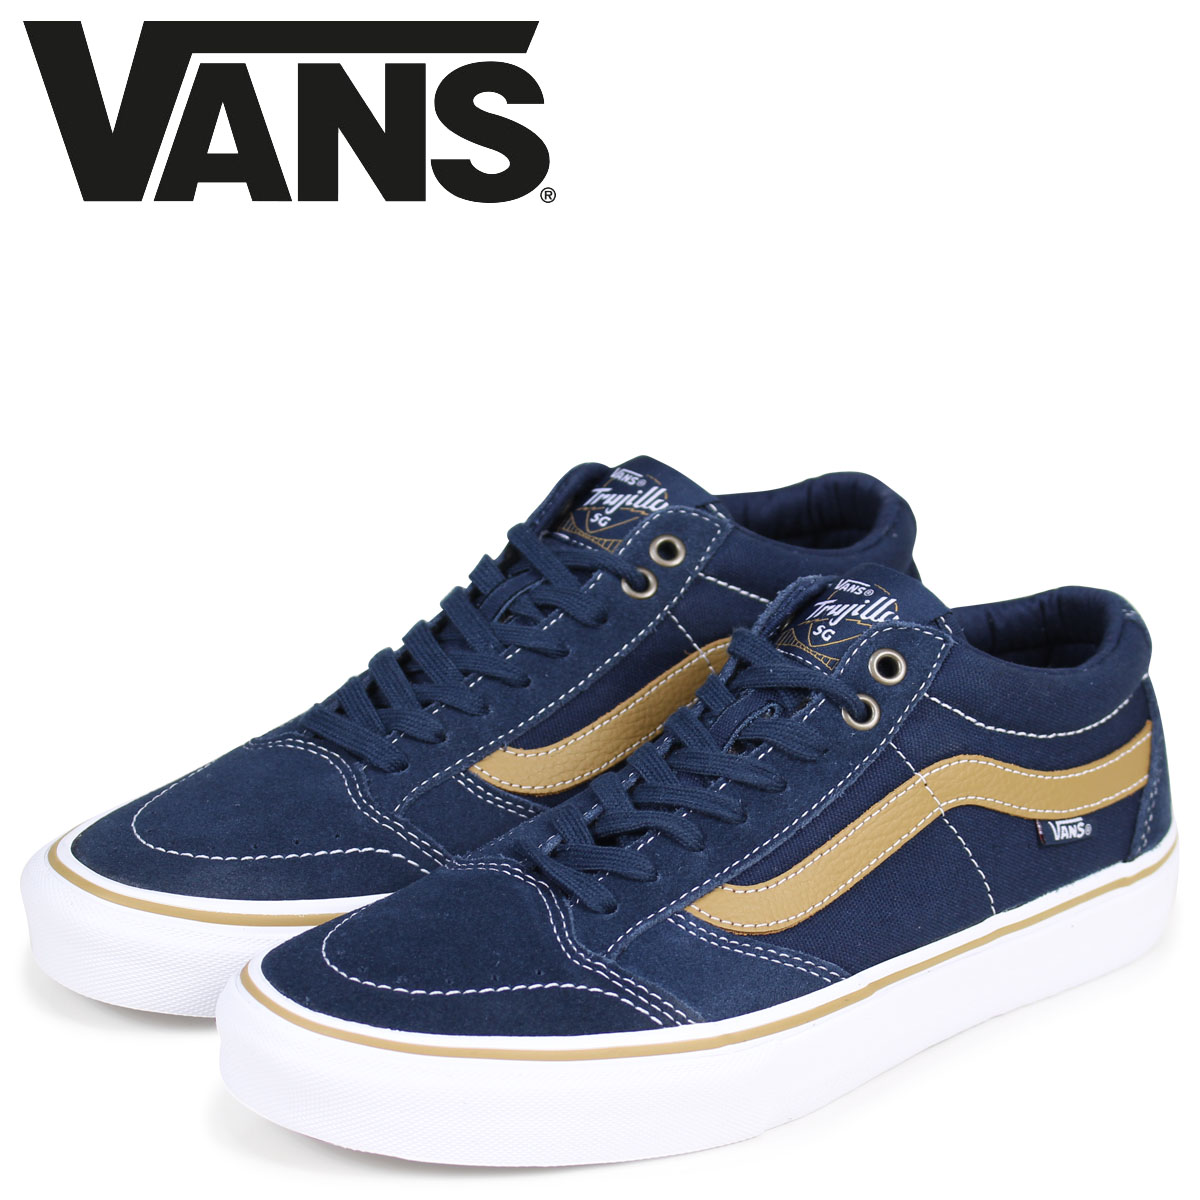 608adcf8c8bf Sugar Online Shop  Vans TNT SG sneakers men VANS ヴァンズトニー ...